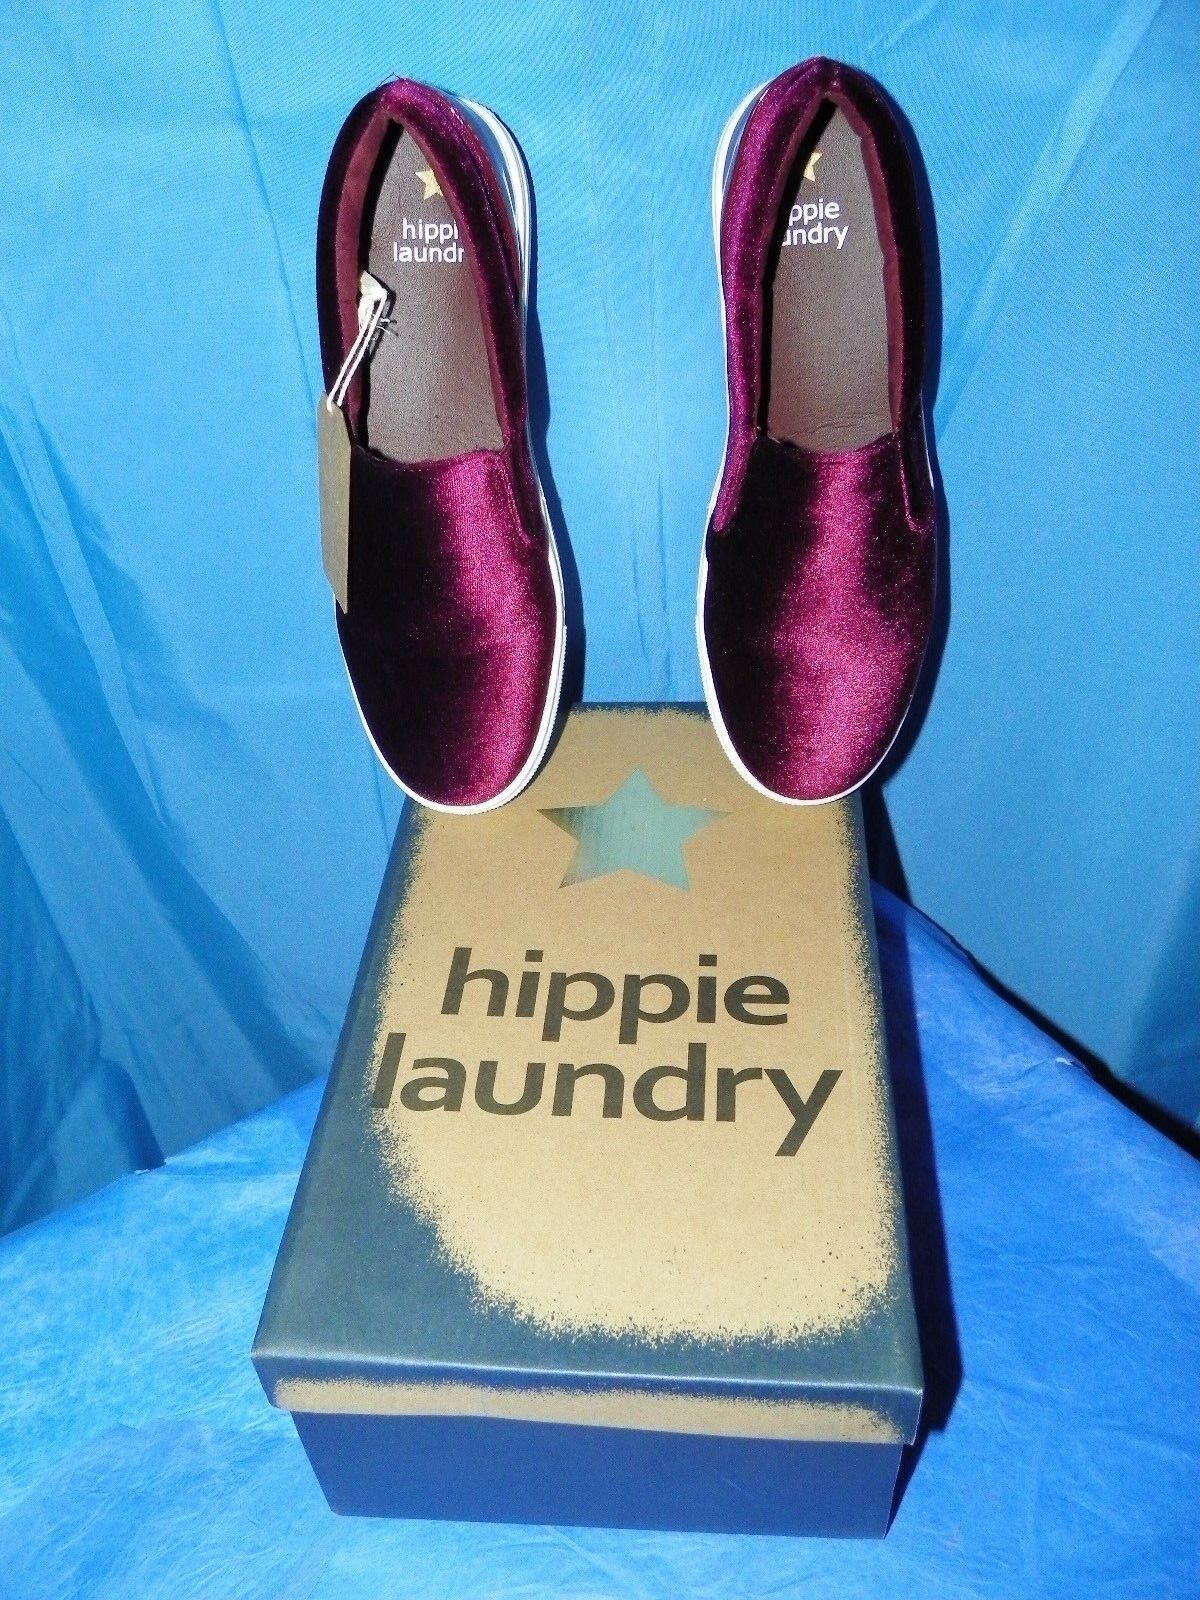 HIPPIE LAUNDRY damen PIPPA BURGUNDY SLIP ON ON ON schuhe A5136-31K Größe 8.5 NEW IN BOX ce7780